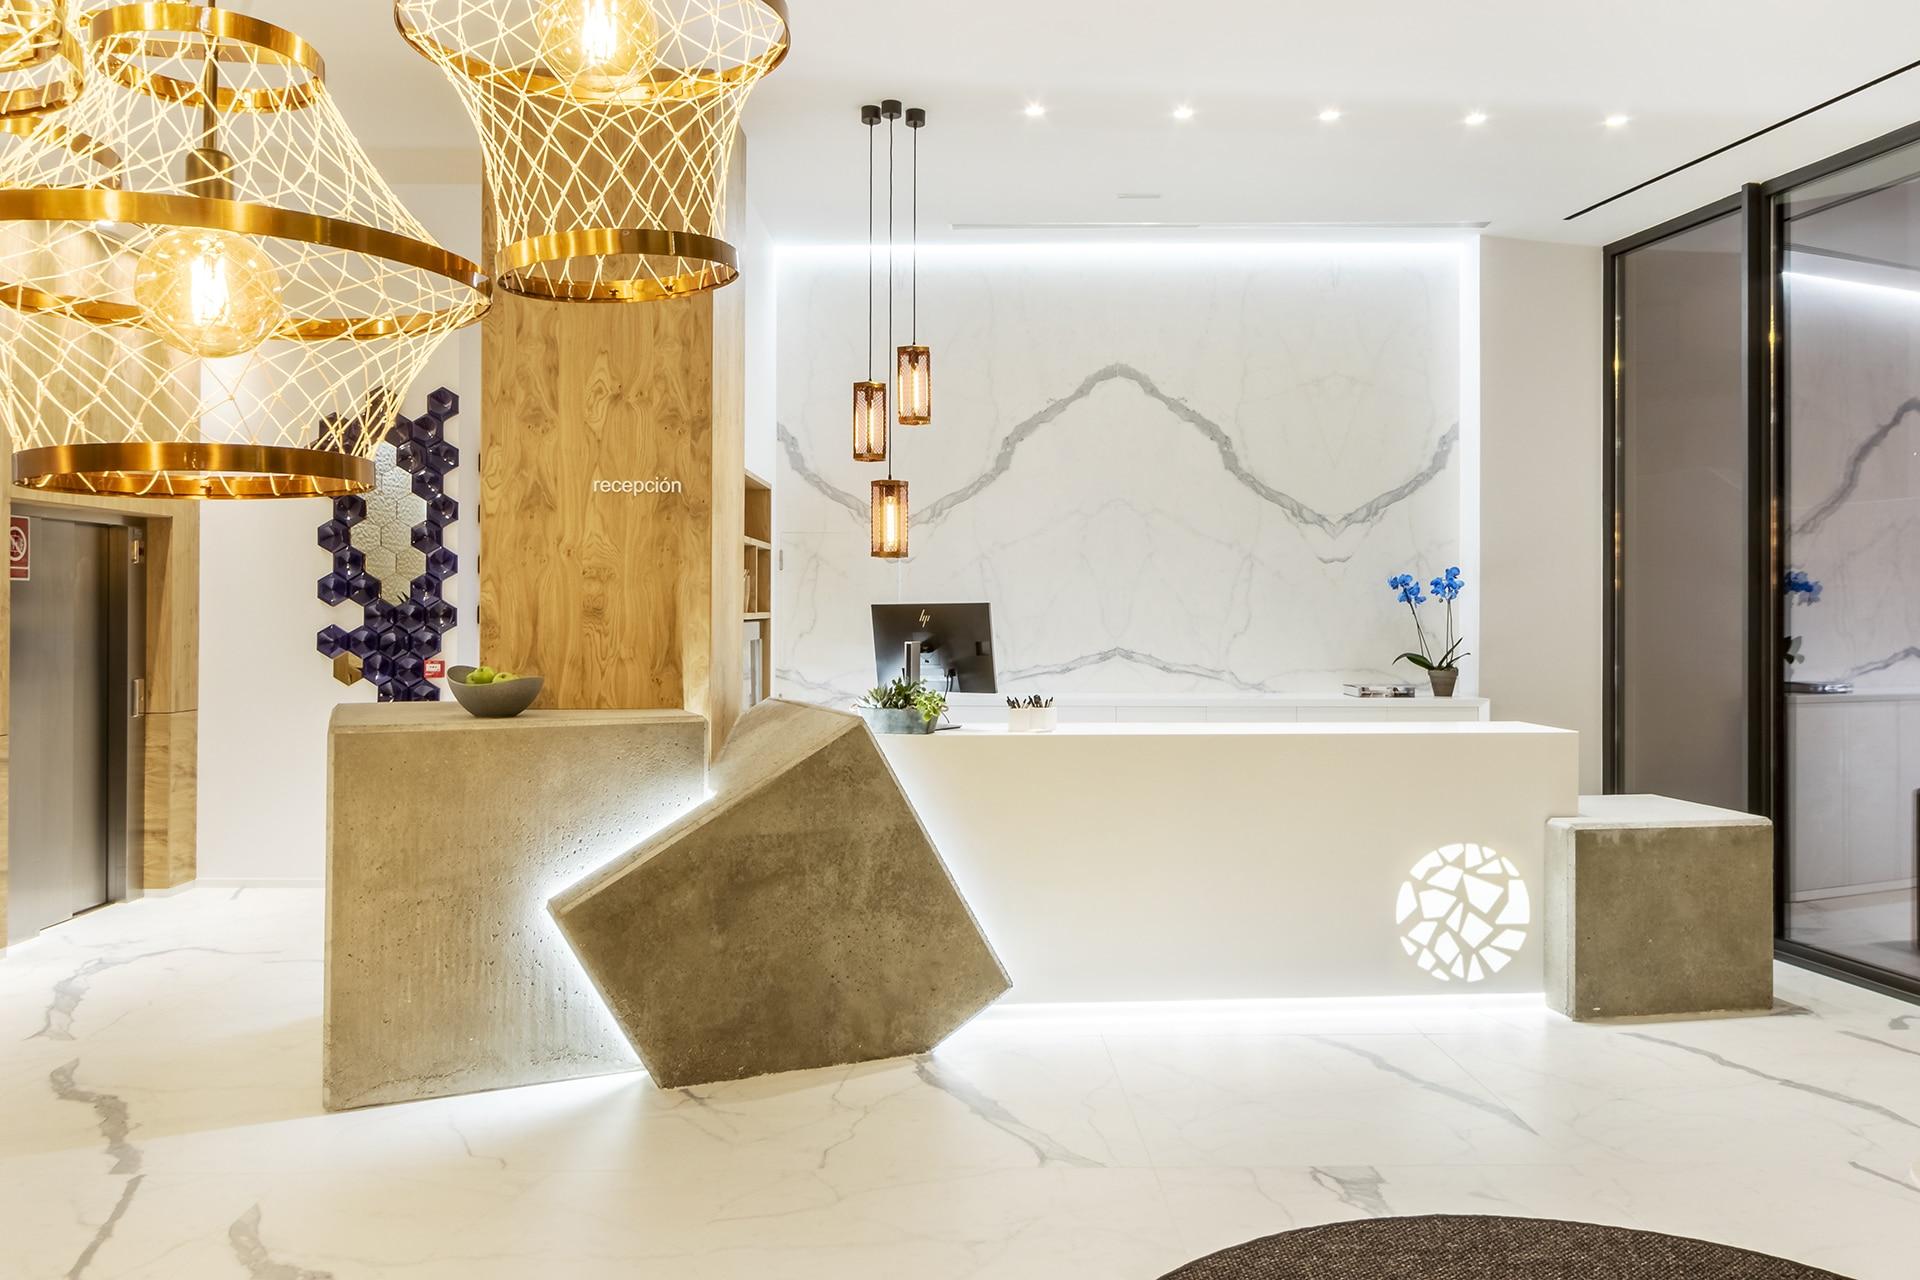 Silgar92_Hotel_Receptionfront